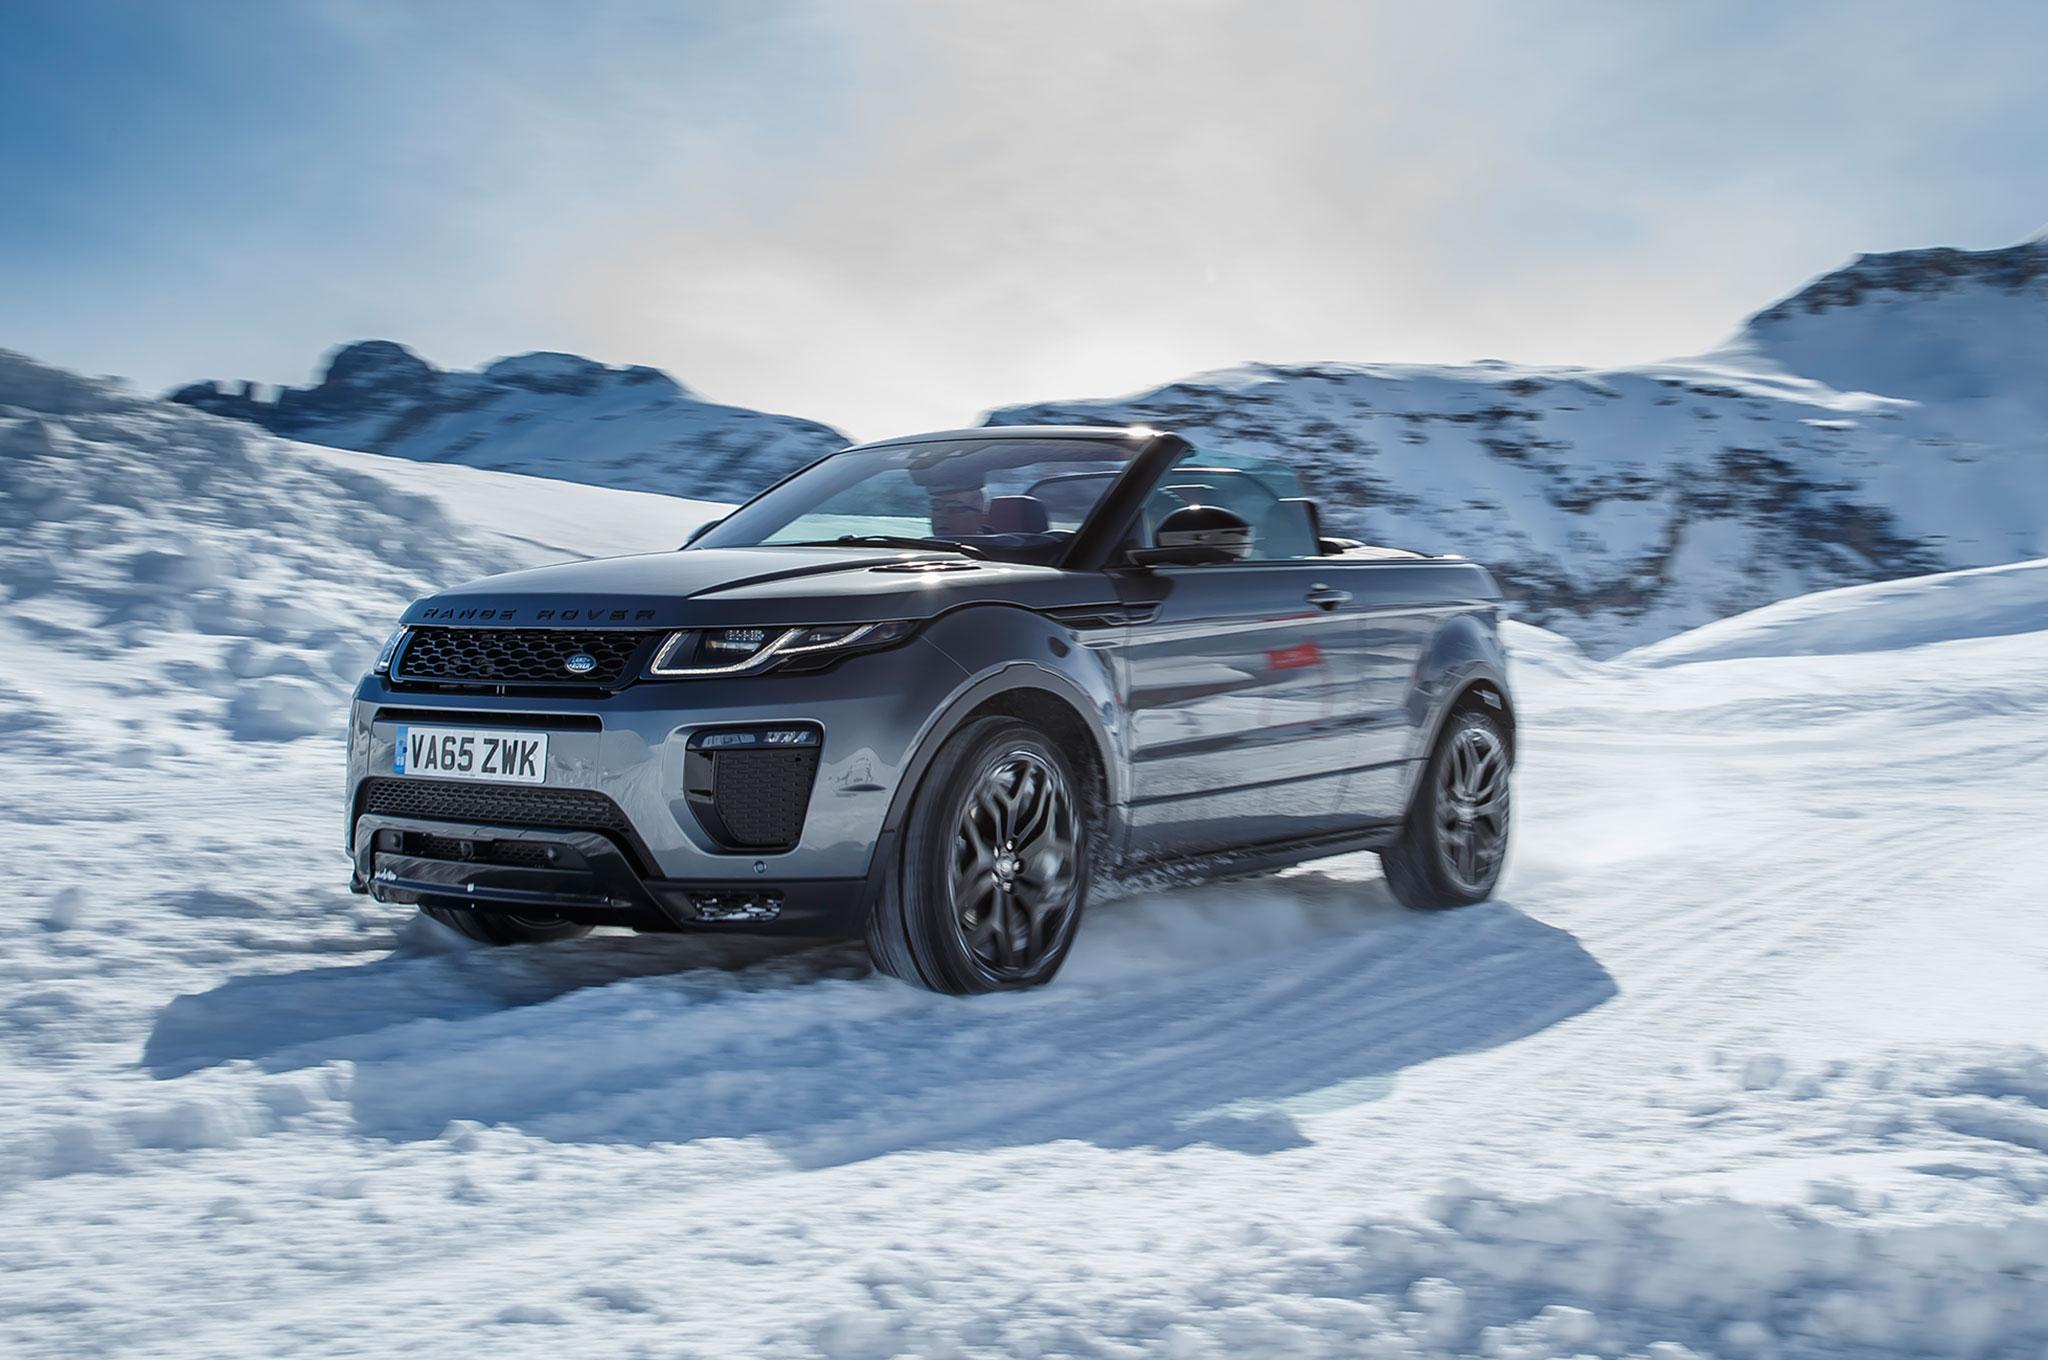 2017 Range Rover Evoque Convertible Front Three Quarter In Motion 07